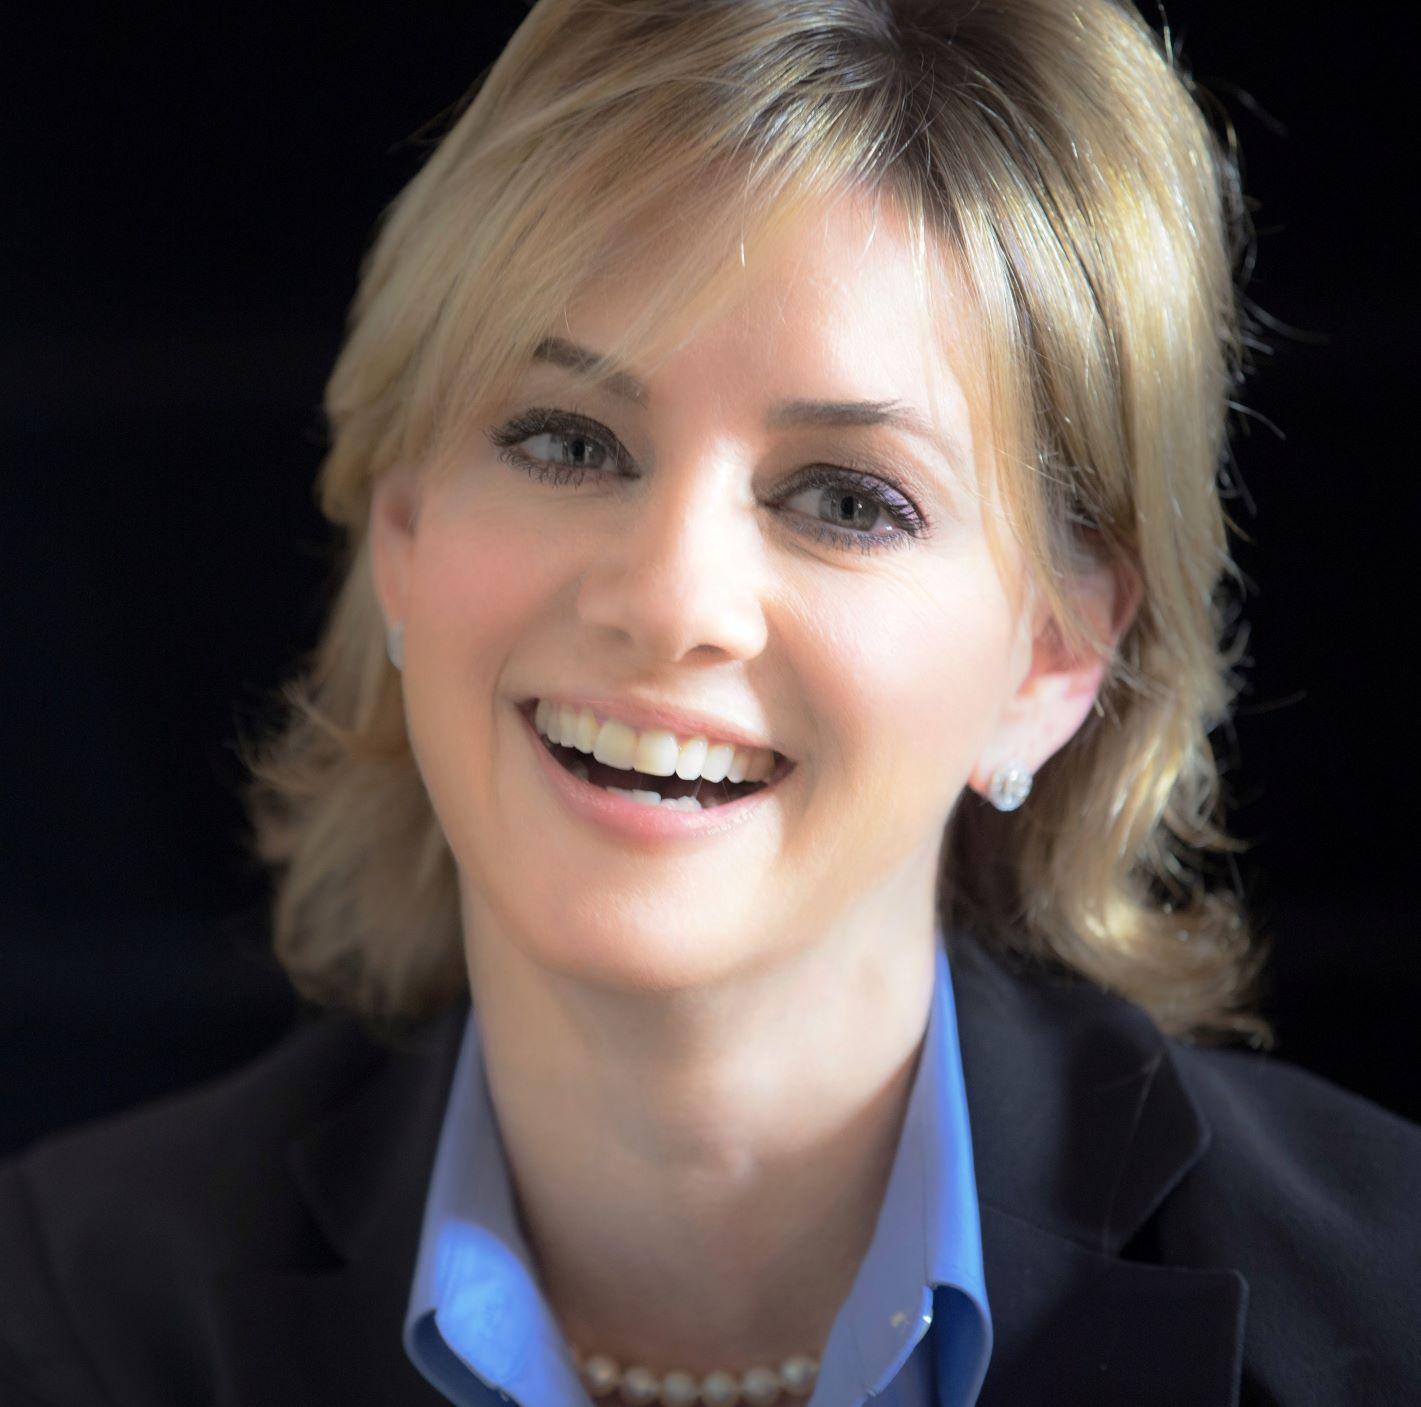 Annmarie Feiler